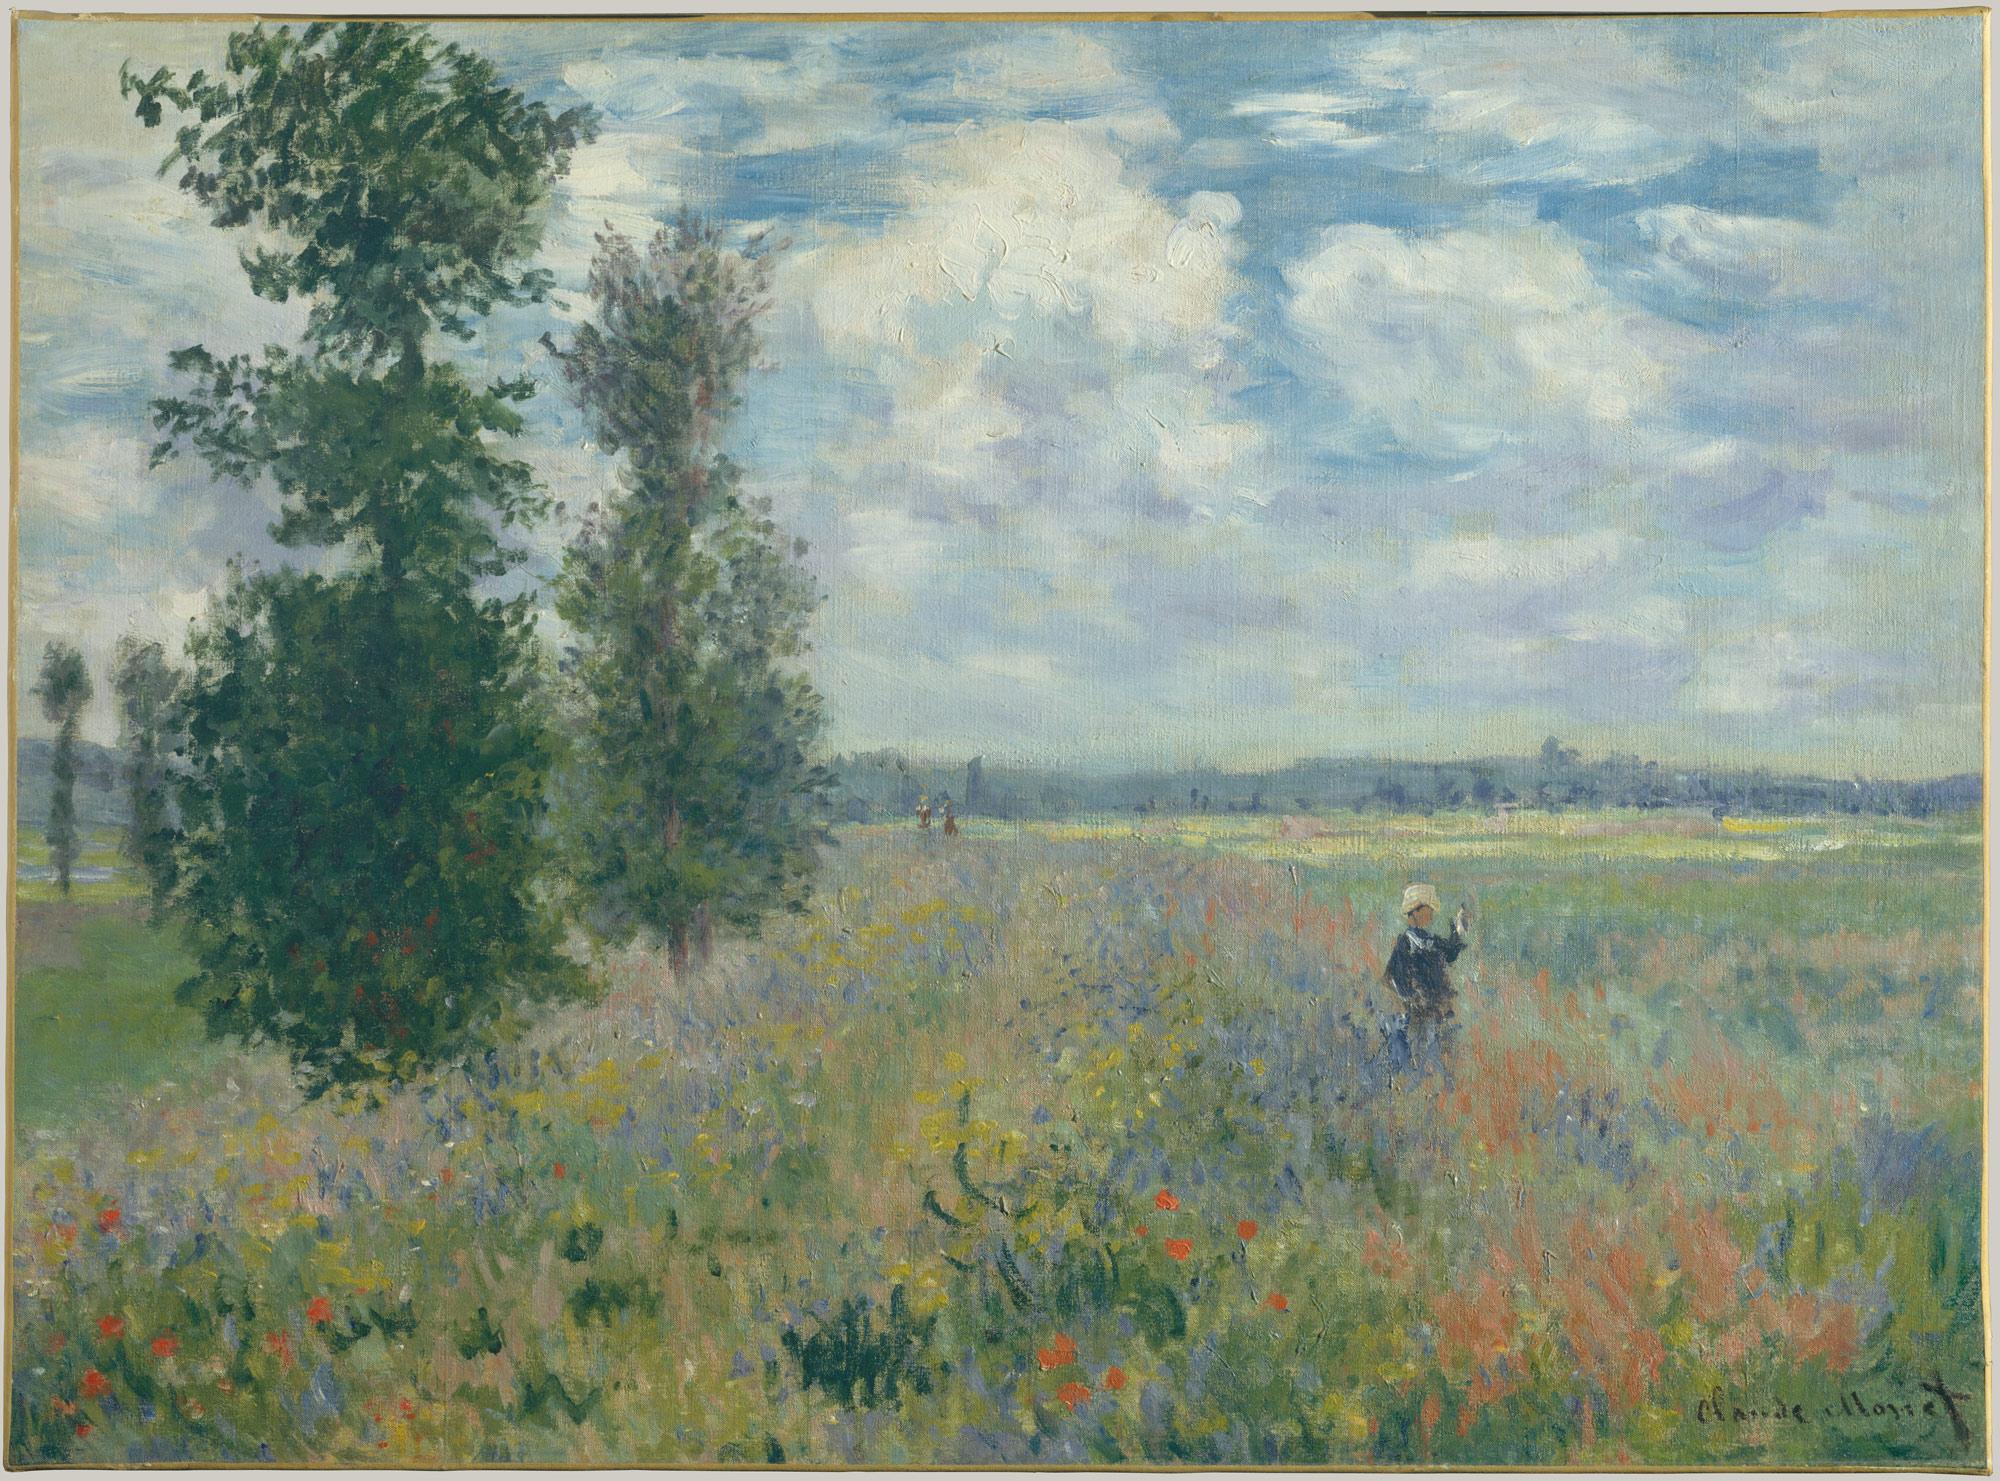 Claude Monet, Poppy Fields near Argenteui l, 1875 @ The MET